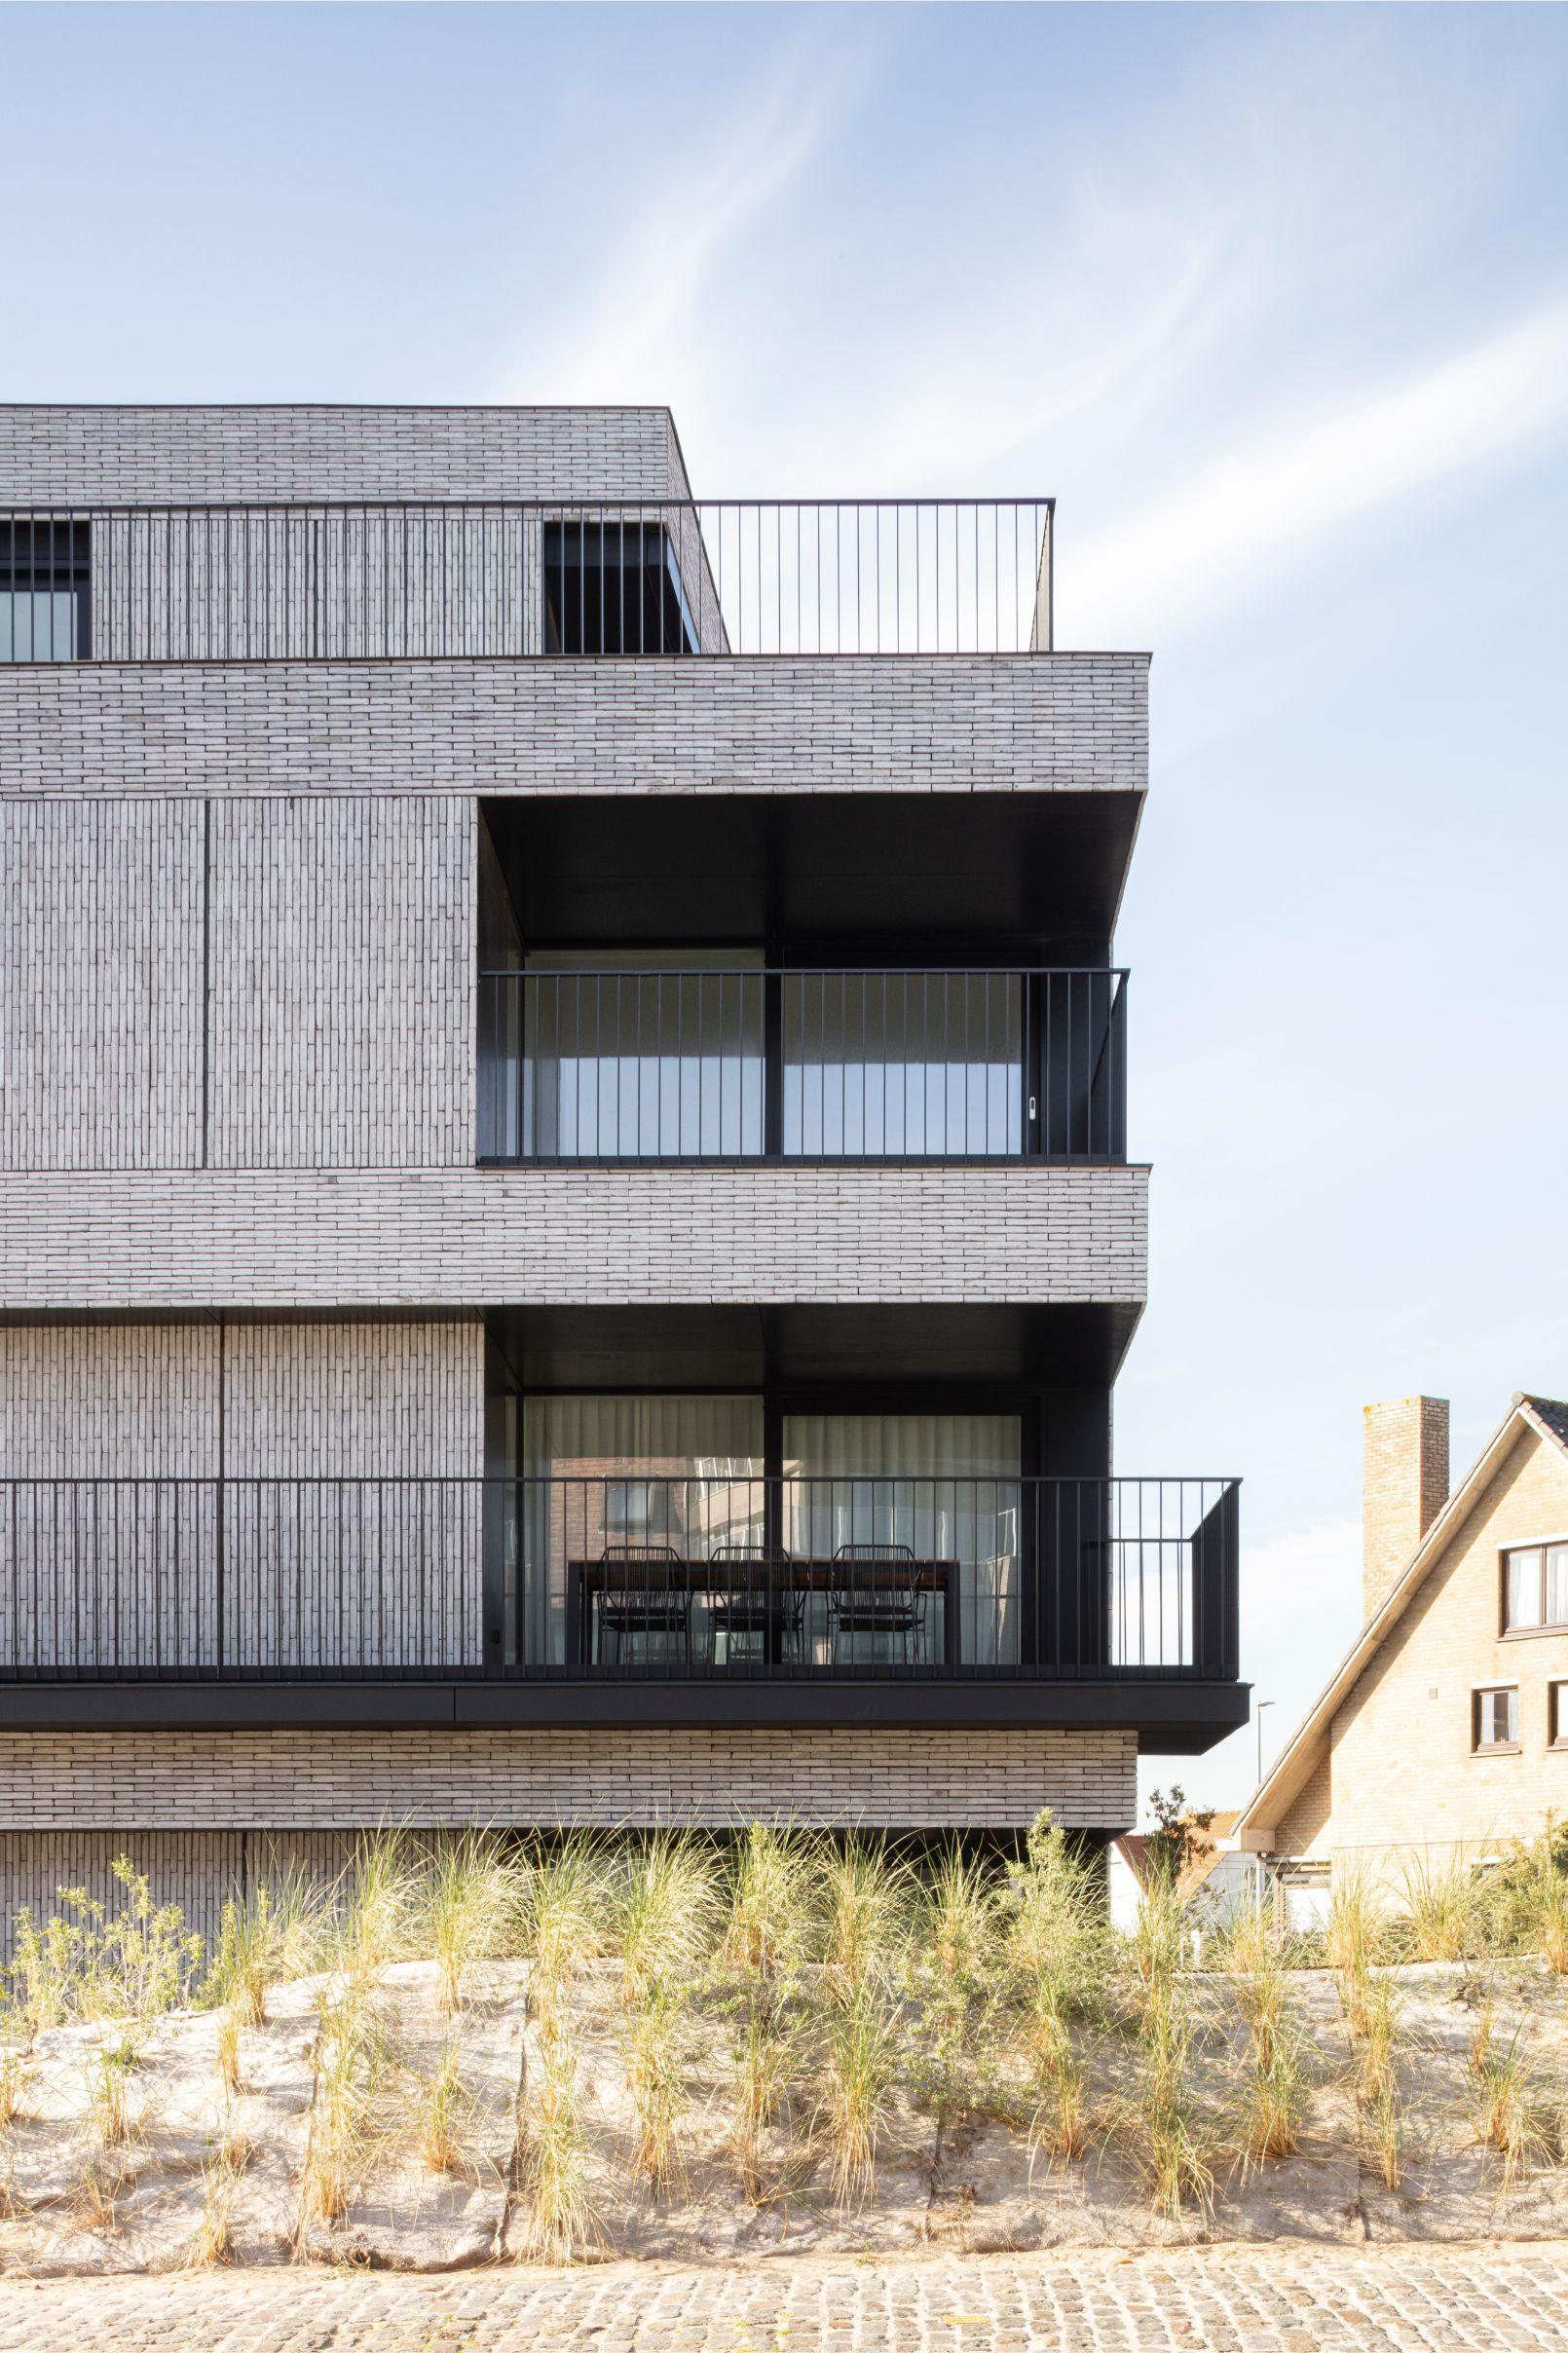 Pierre Paulin - Rietveldprojects - Sint-Idesbald - Tvdv1.jpg